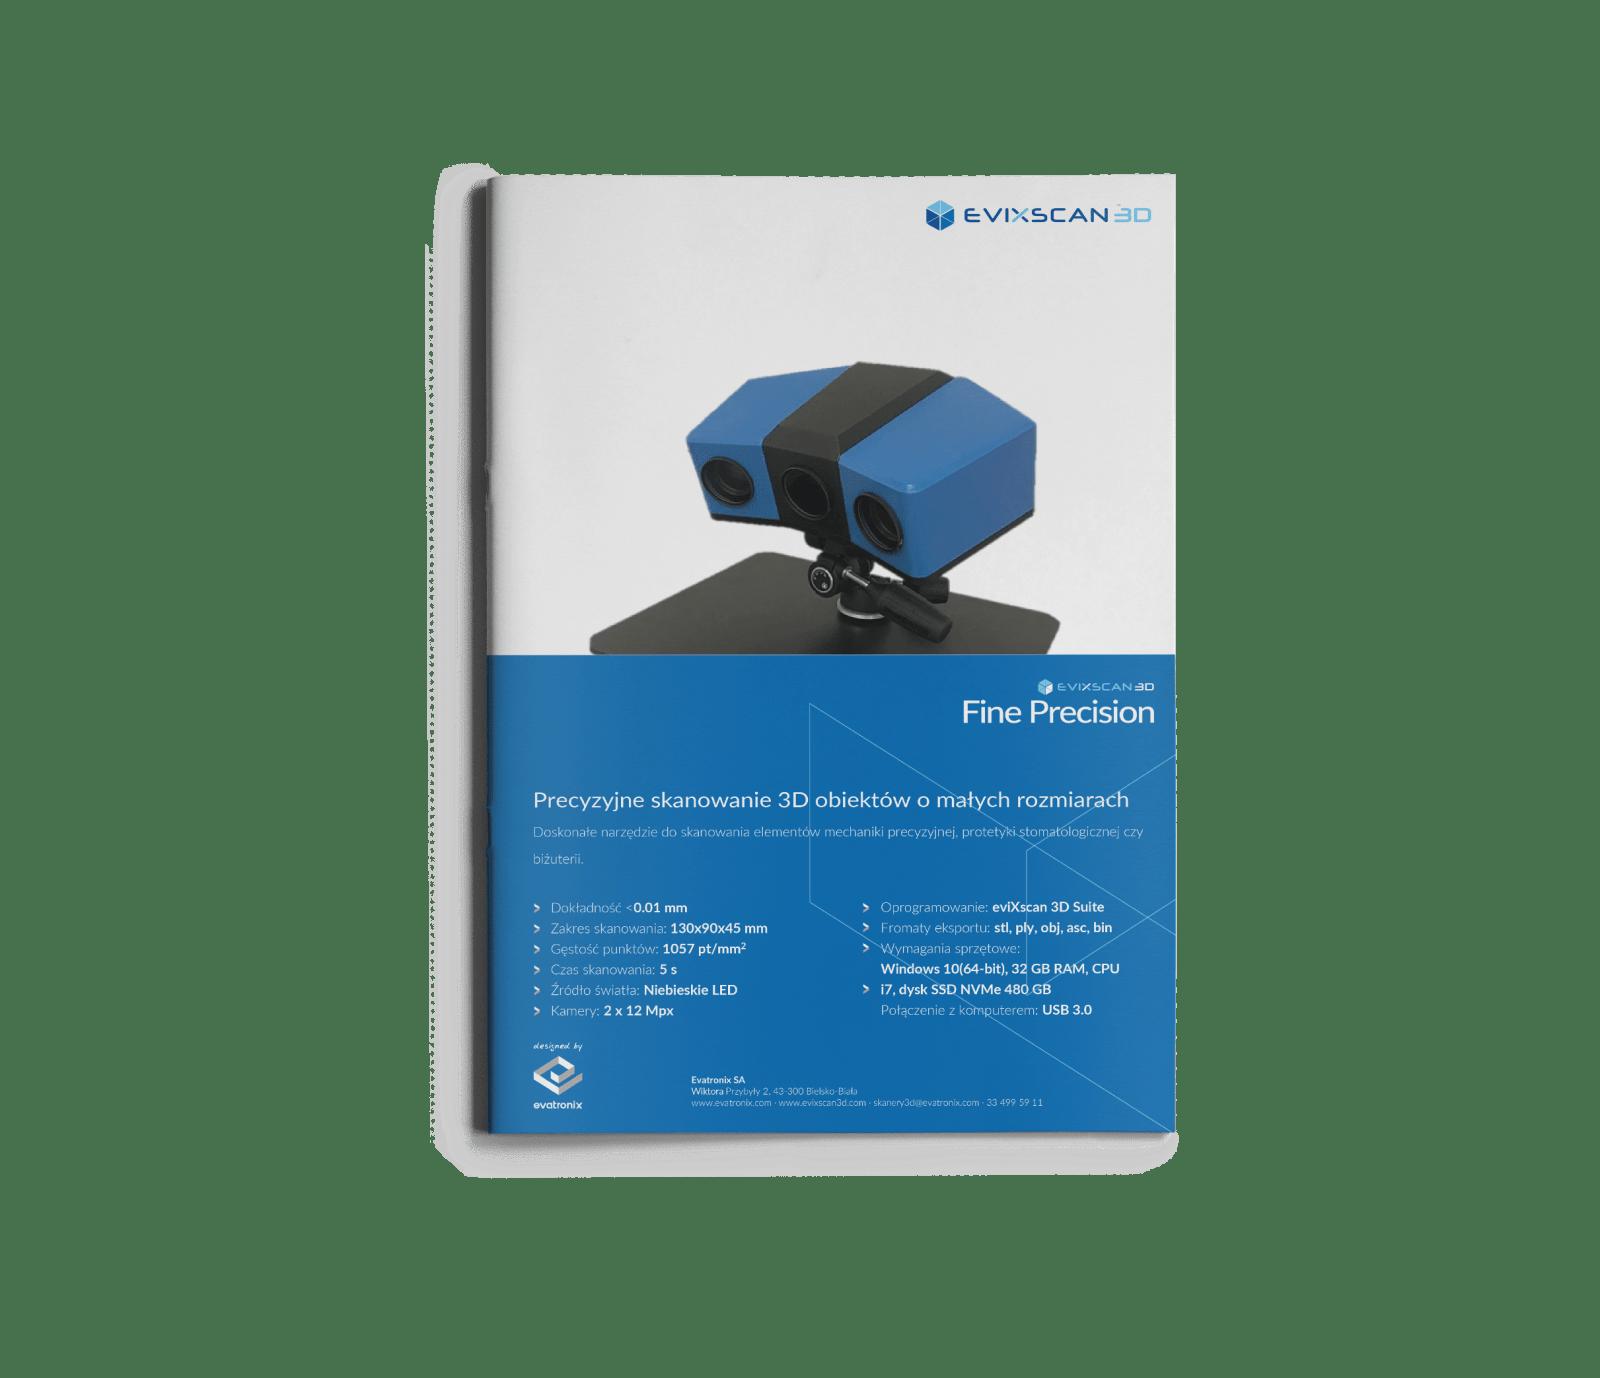 evixscan 3d foldery reklamowe (3)